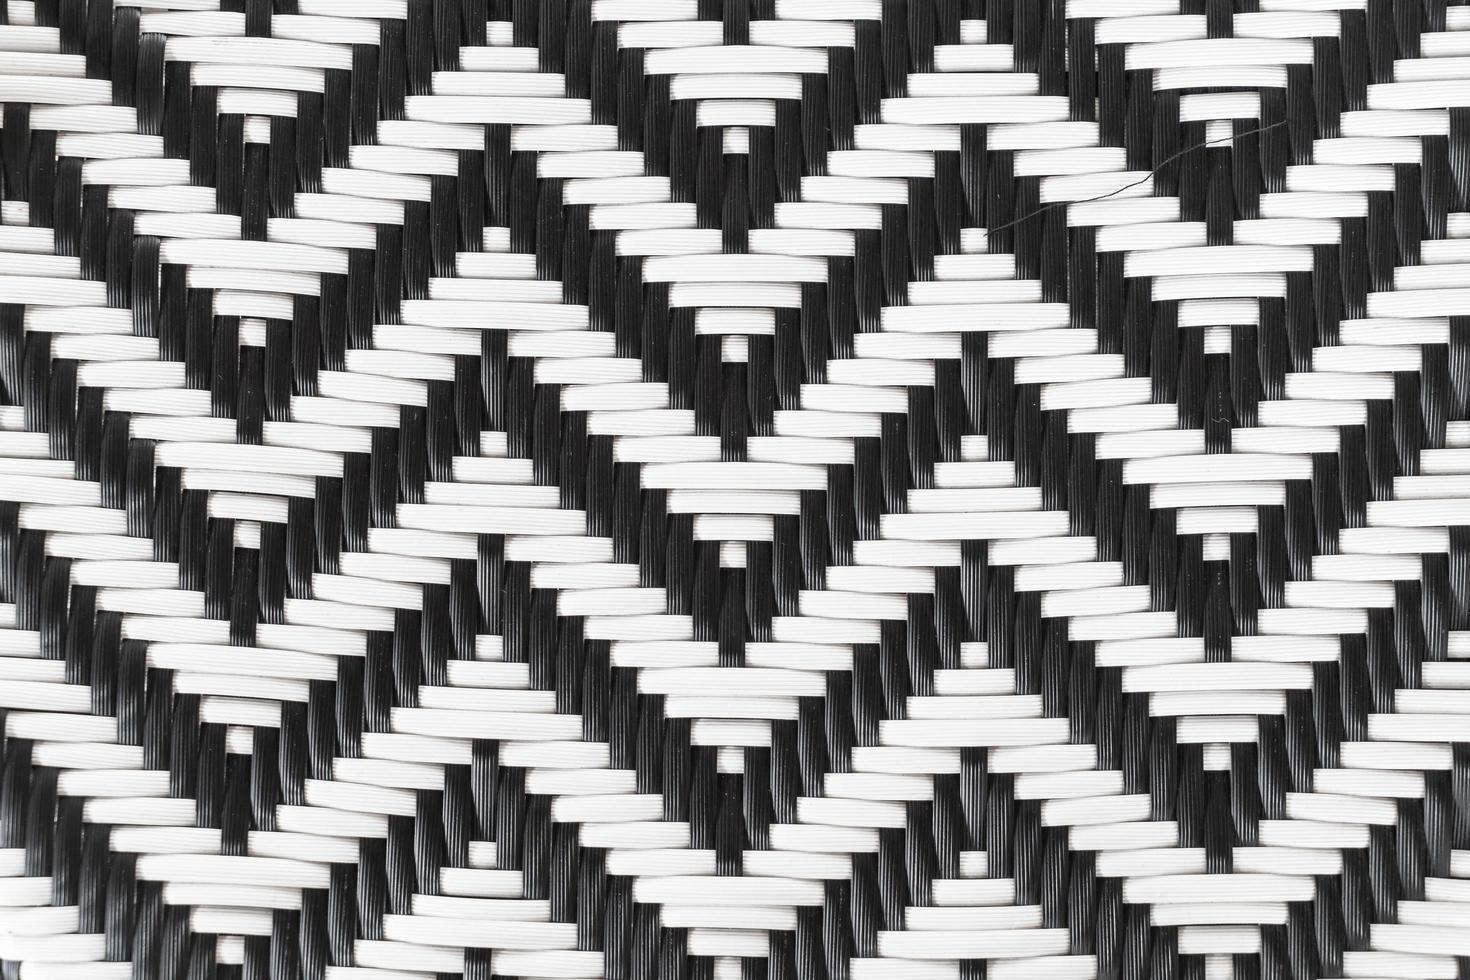 Rattan black and white background photo